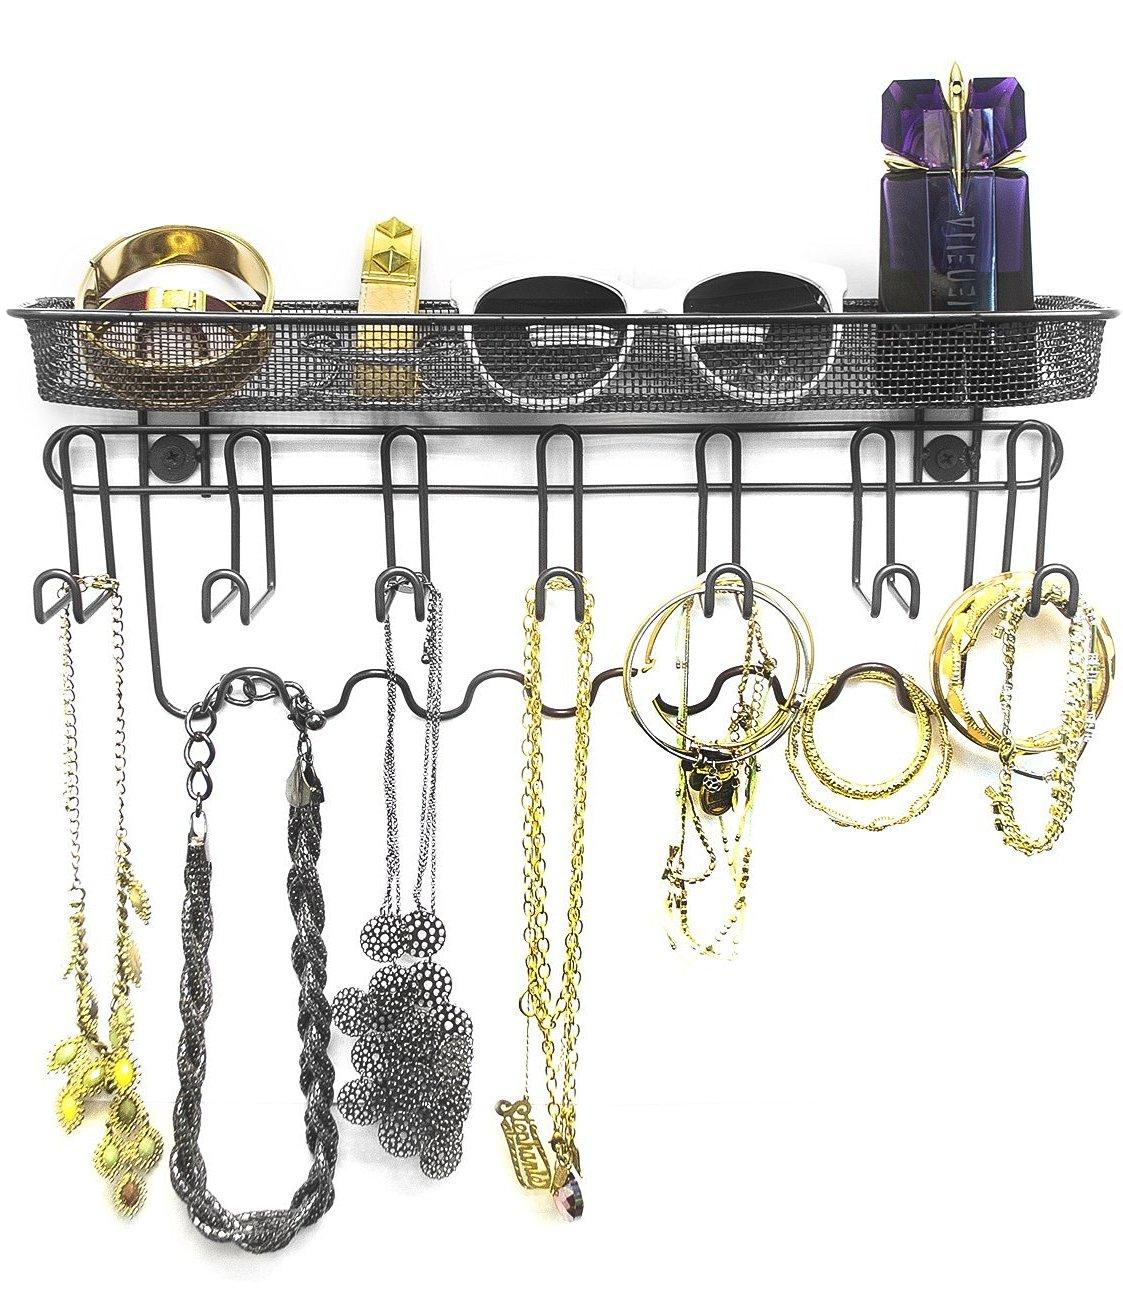 100 decorative key racks for the home spice racks